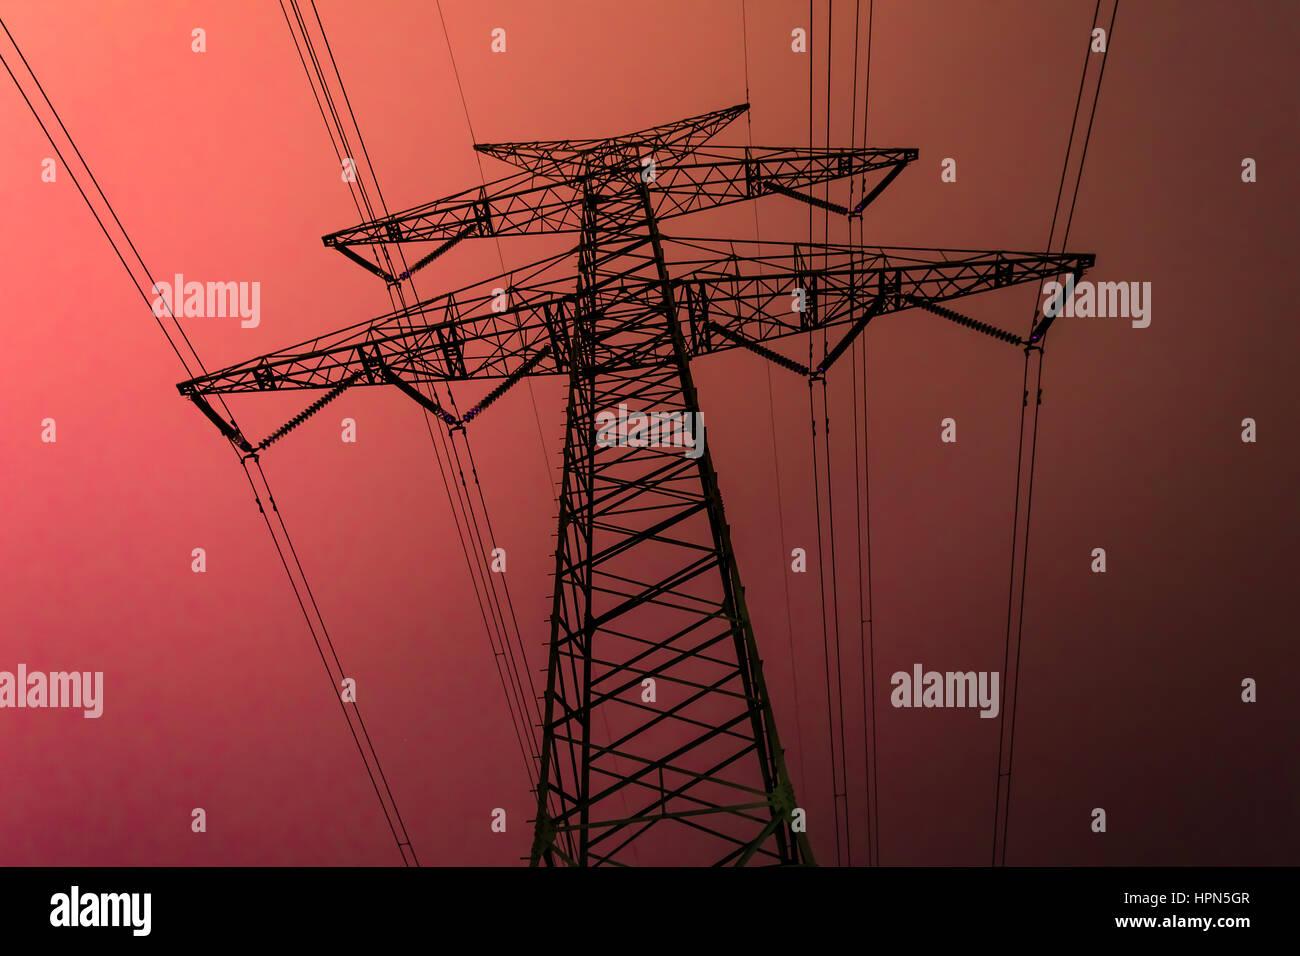 Current Mast Stock Photos & Current Mast Stock Images - Alamy